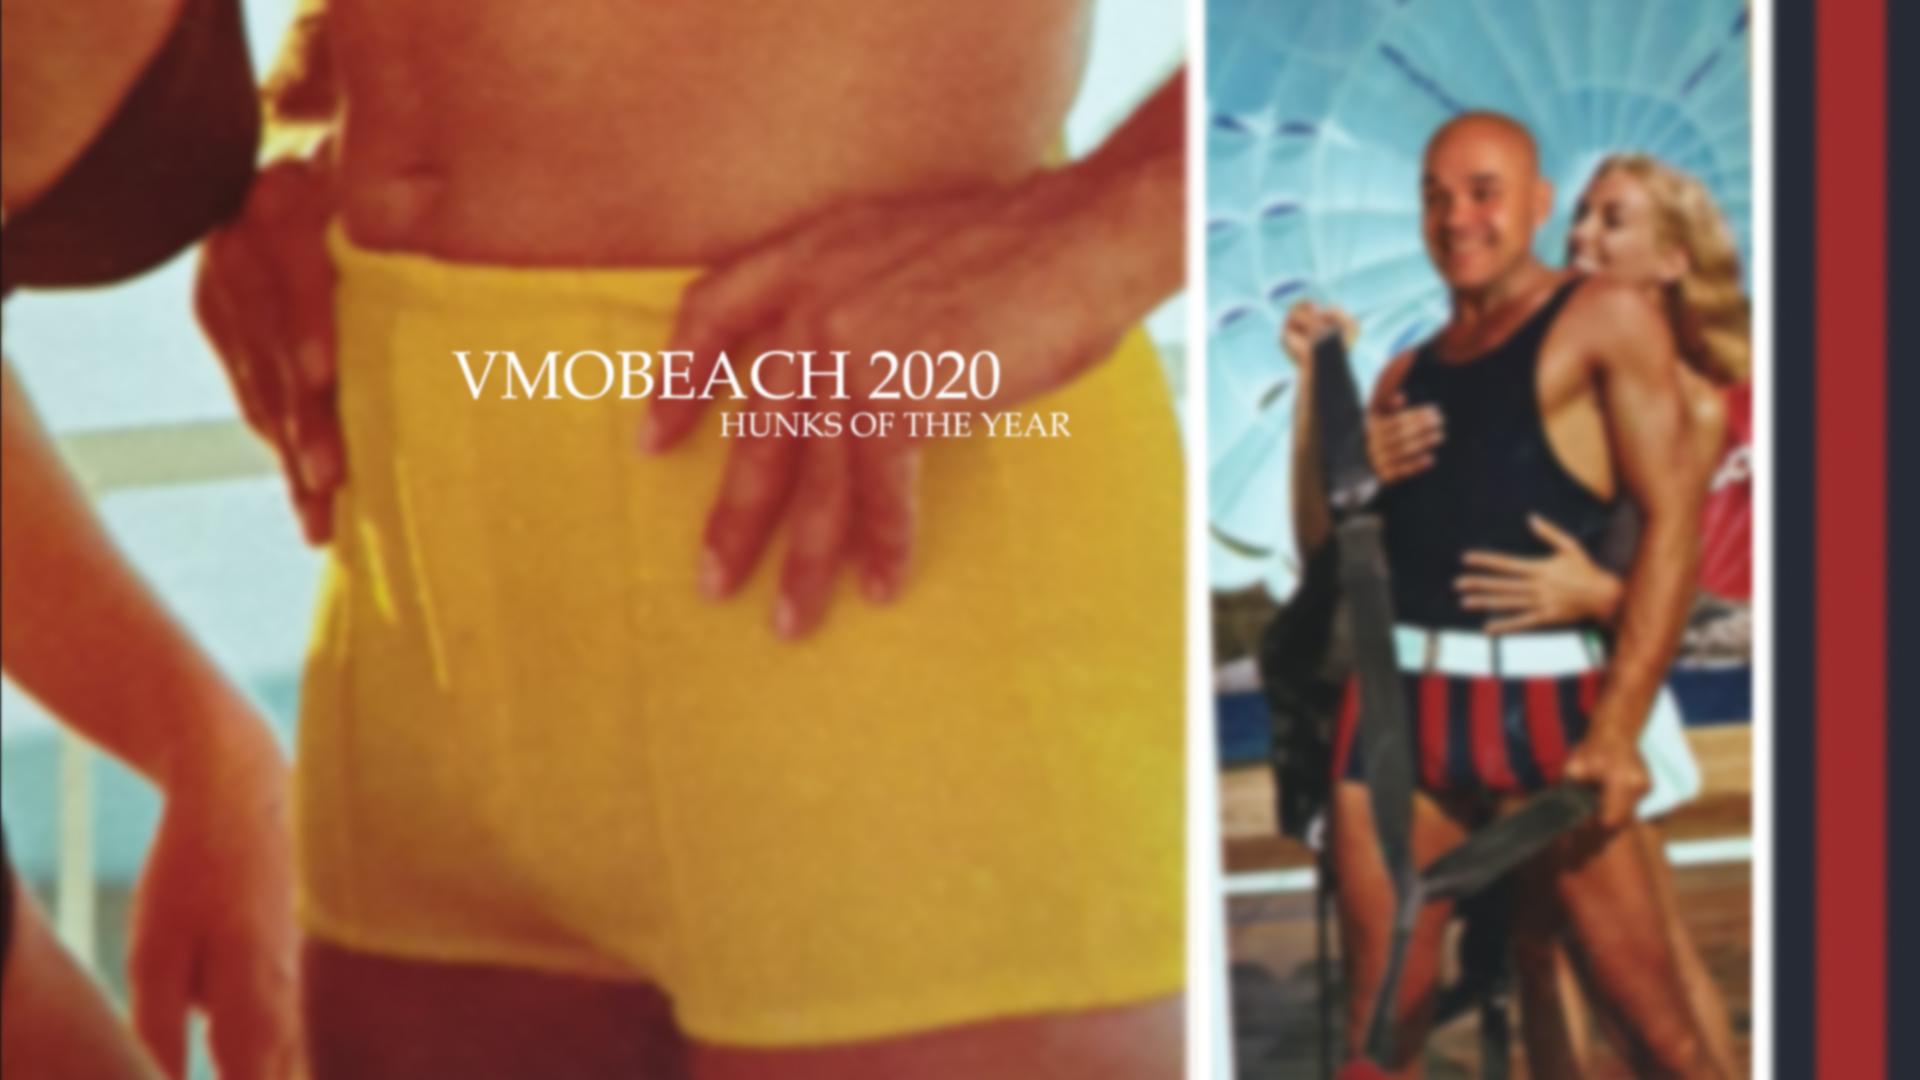 MOPS 1aprilskämt 2020. Badkalender.